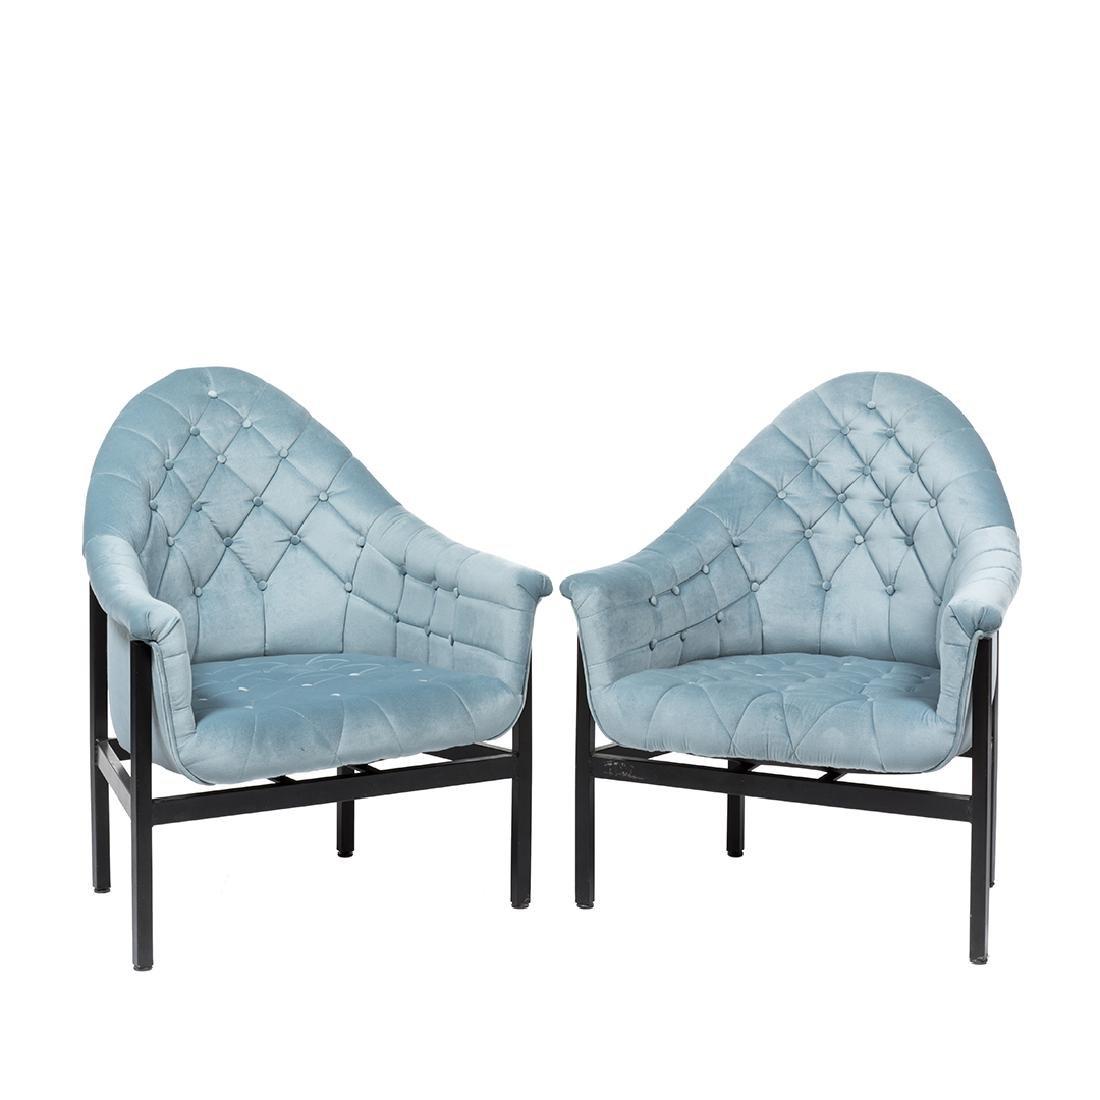 Modernist Club Chairs (2)